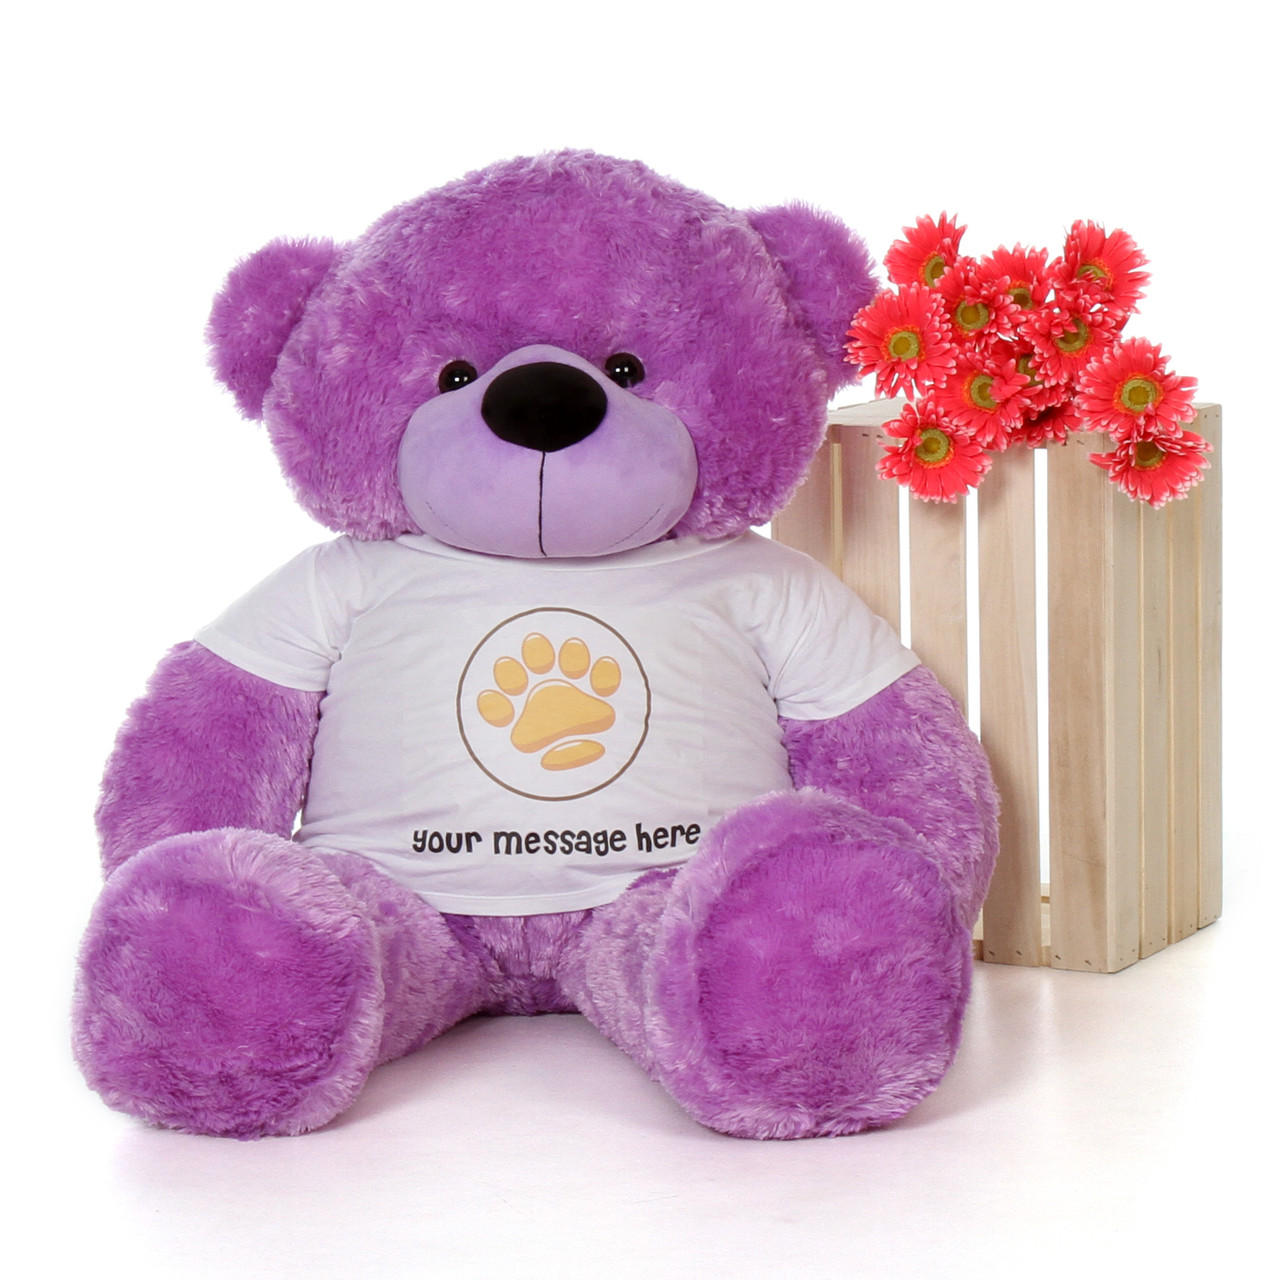 48in DeeDee Cuddles Purple Giant Teddy Bear in Valentine's Day Paw Stamp T-Shirt